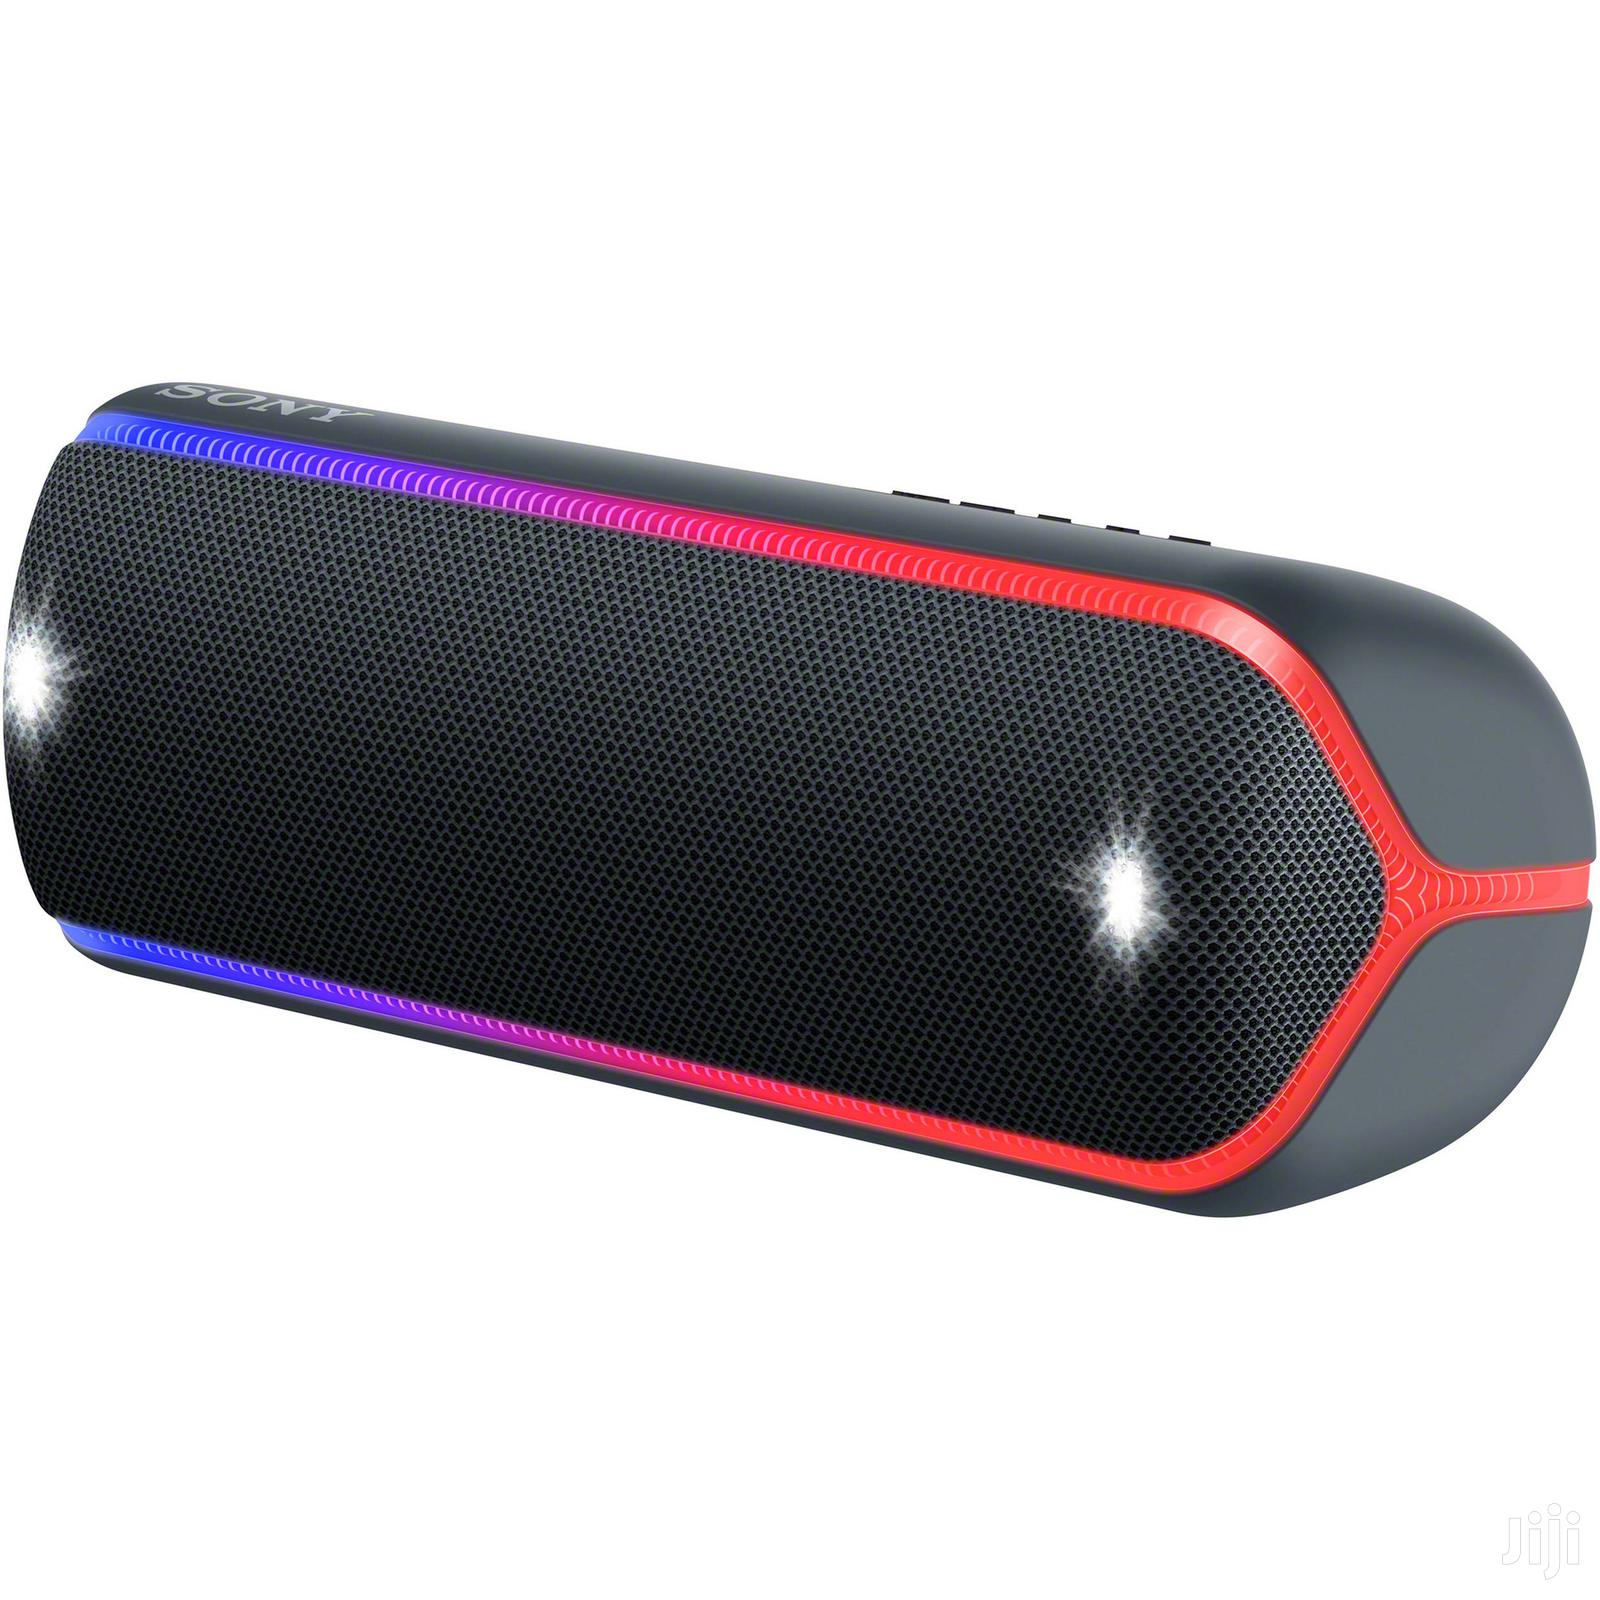 Srs Xb32 Sony Extra Basstm Portable Bluetooth Speaker In Nairobi Central Audio Music Equipment Samitramar Trading Kenya Jiji Co Ke For Sale In Nairobi Central Buy Audio Music Equipment From